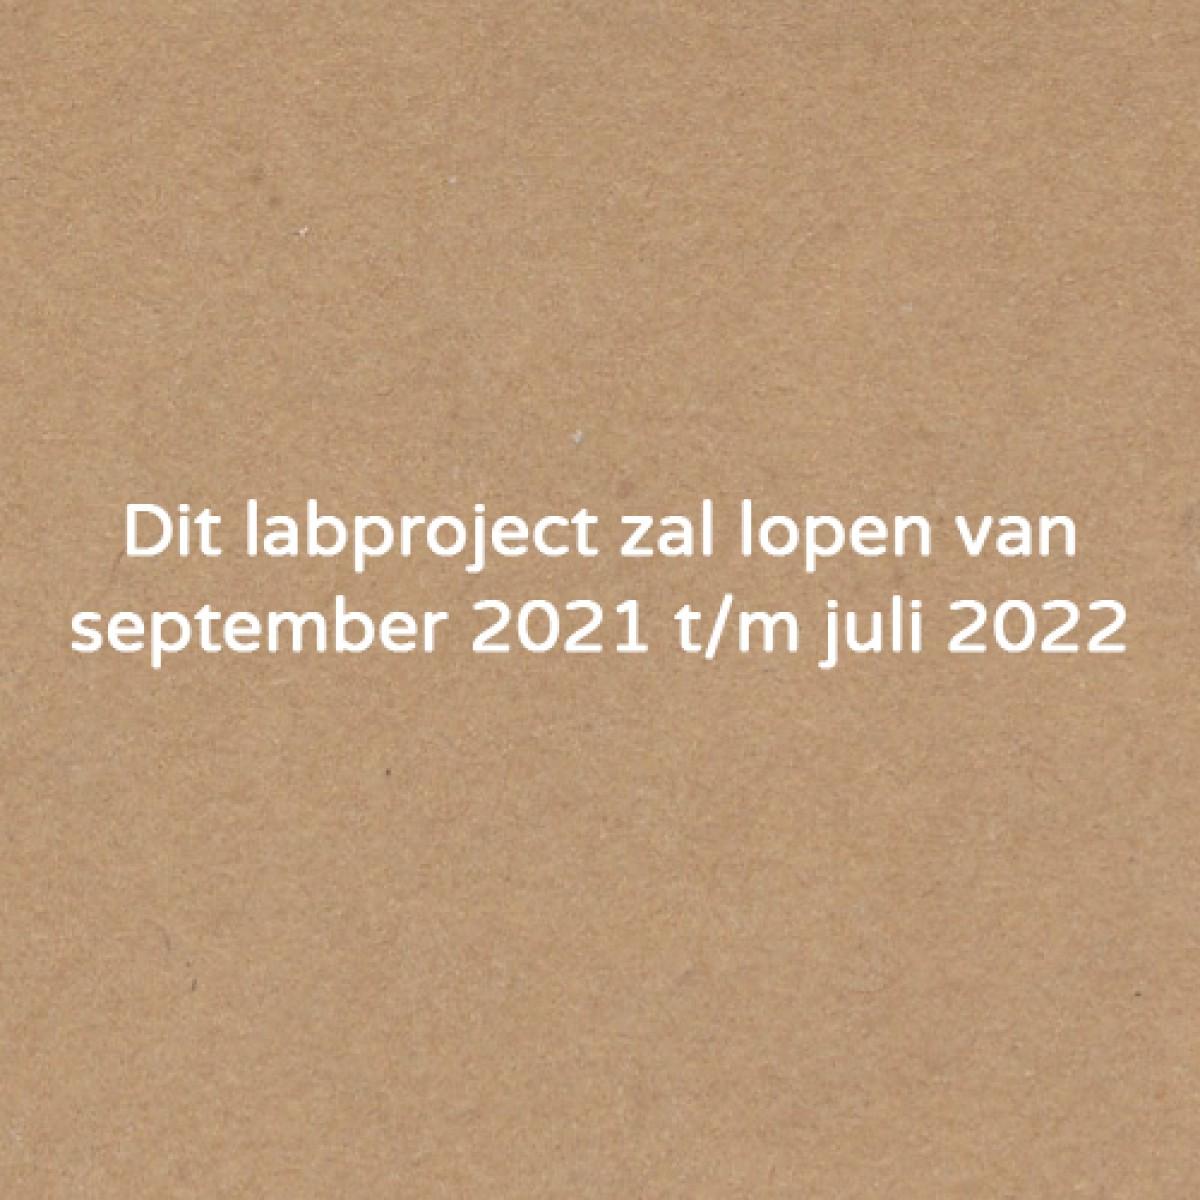 Labproject: Emile bloeit in Utrecht